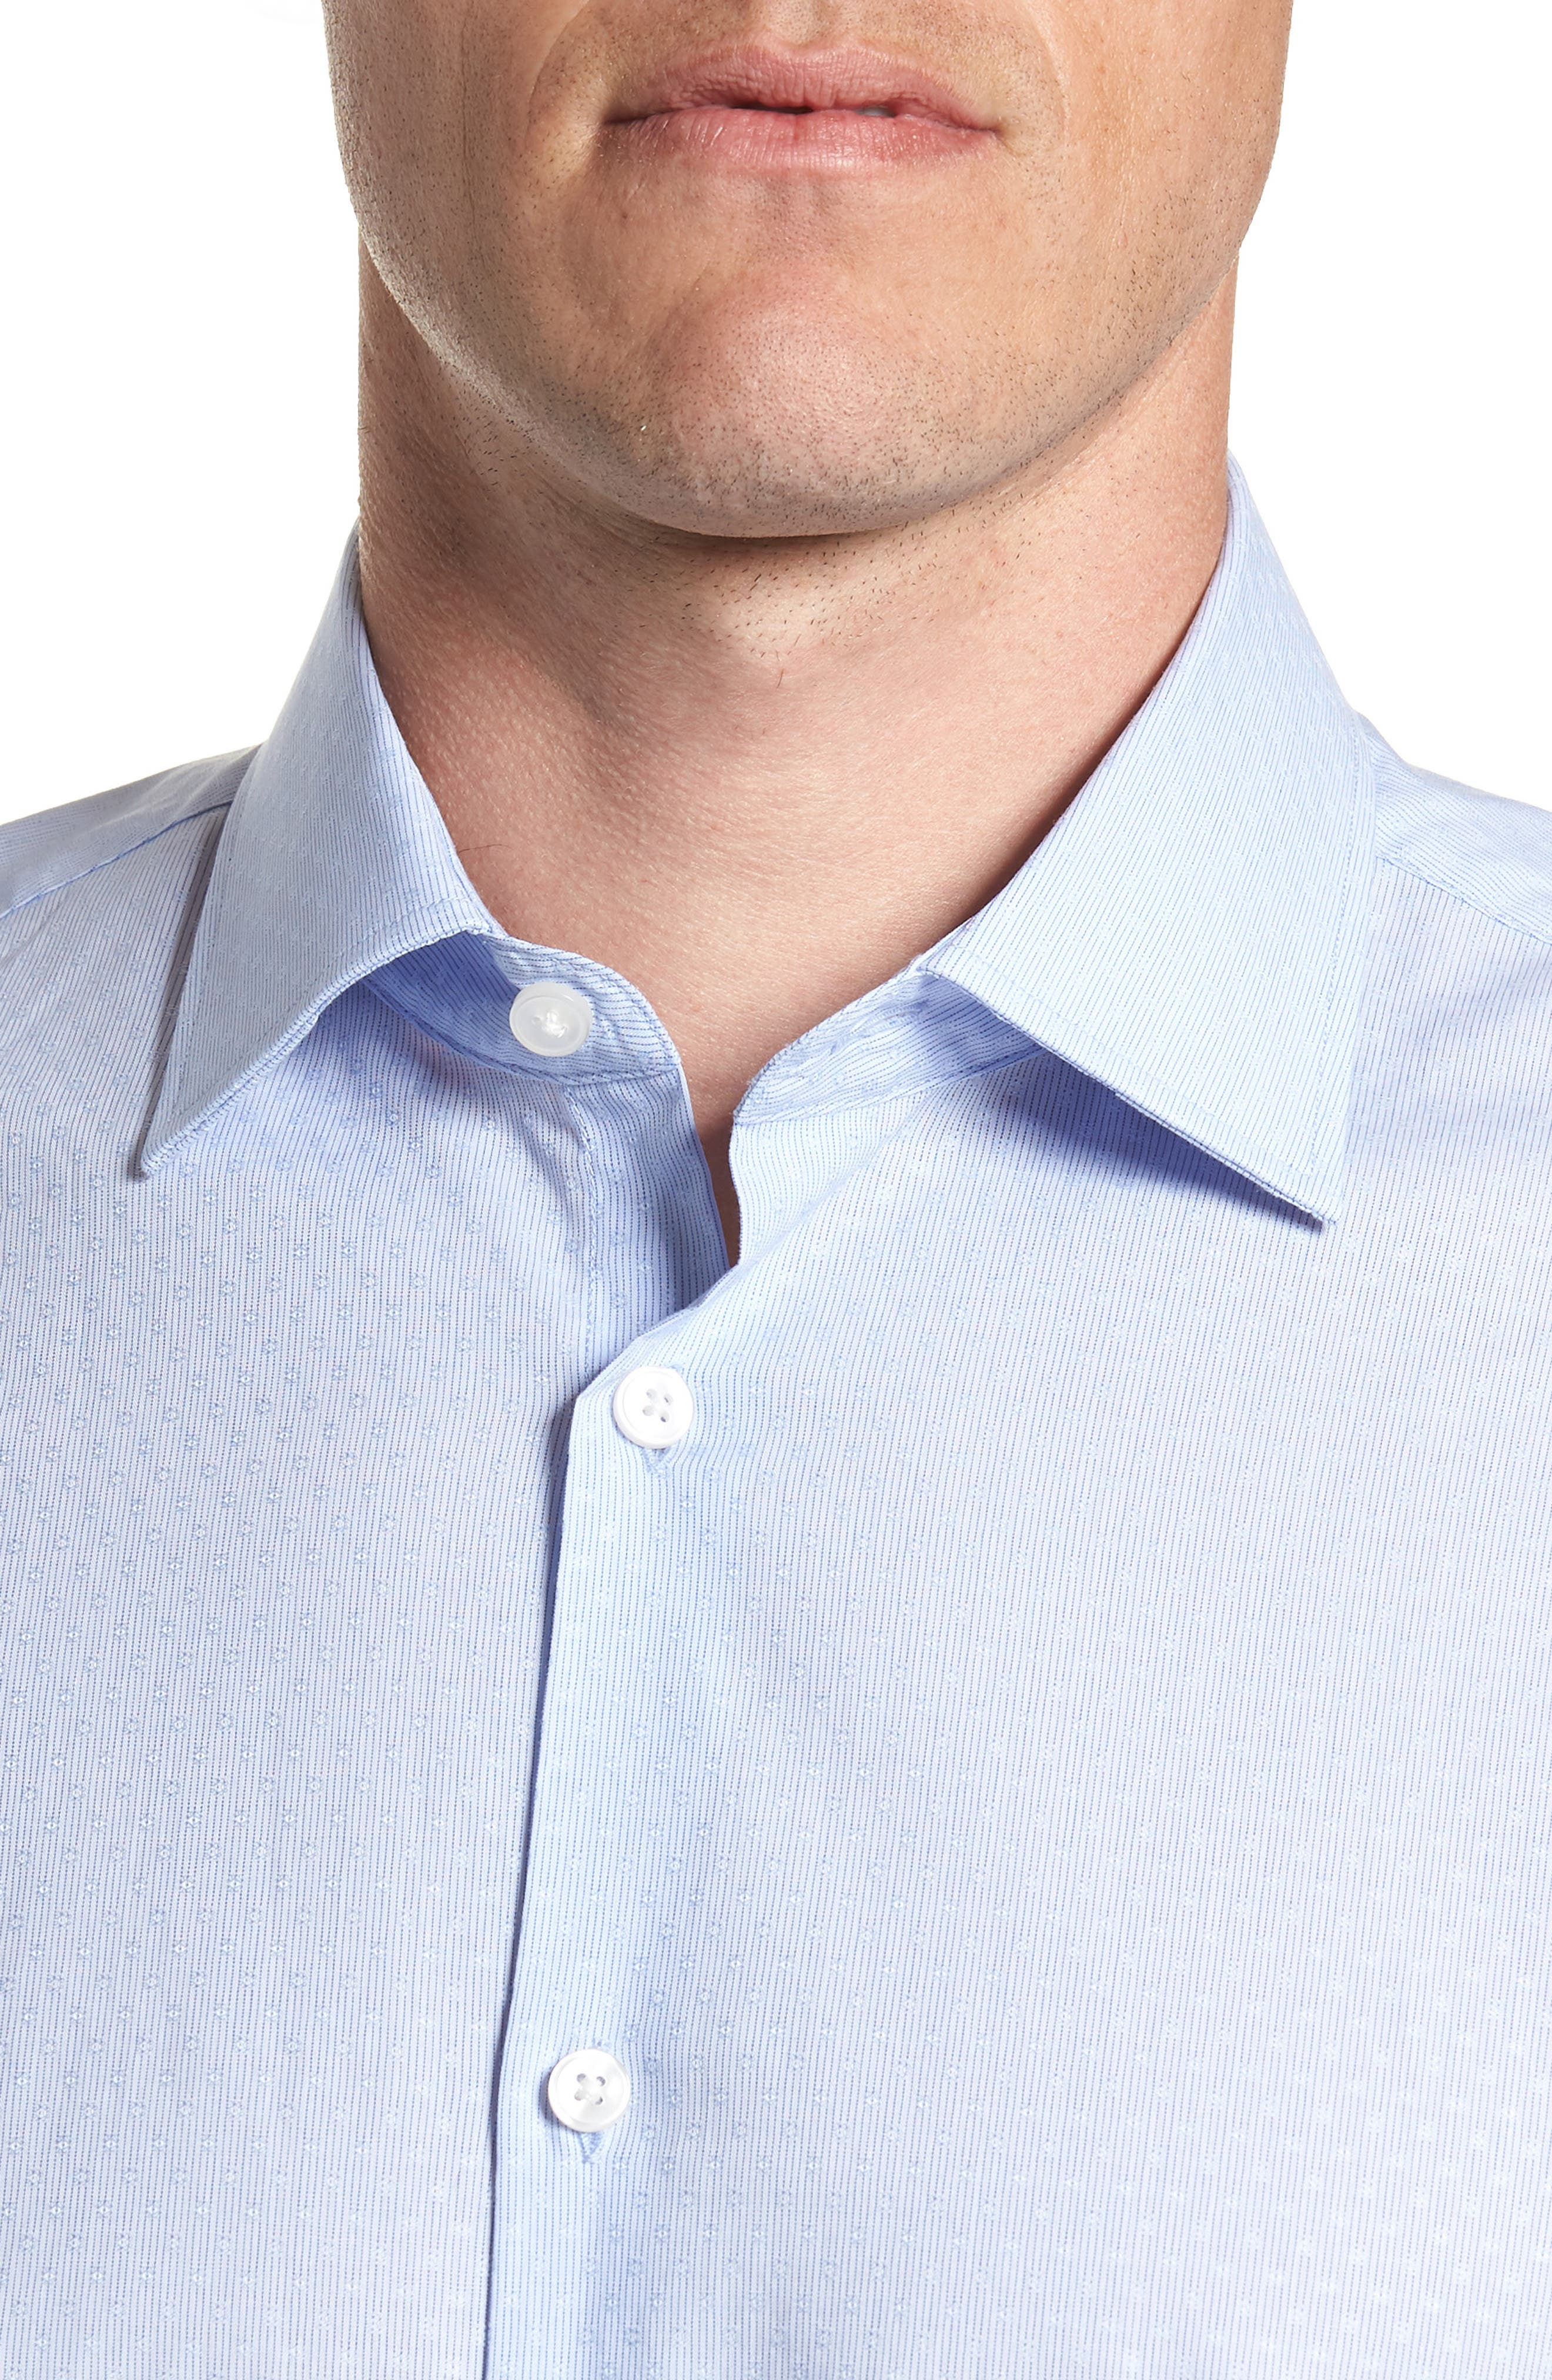 Regular Fit Stripe Dress Shirt,                             Alternate thumbnail 2, color,                             CLOUD